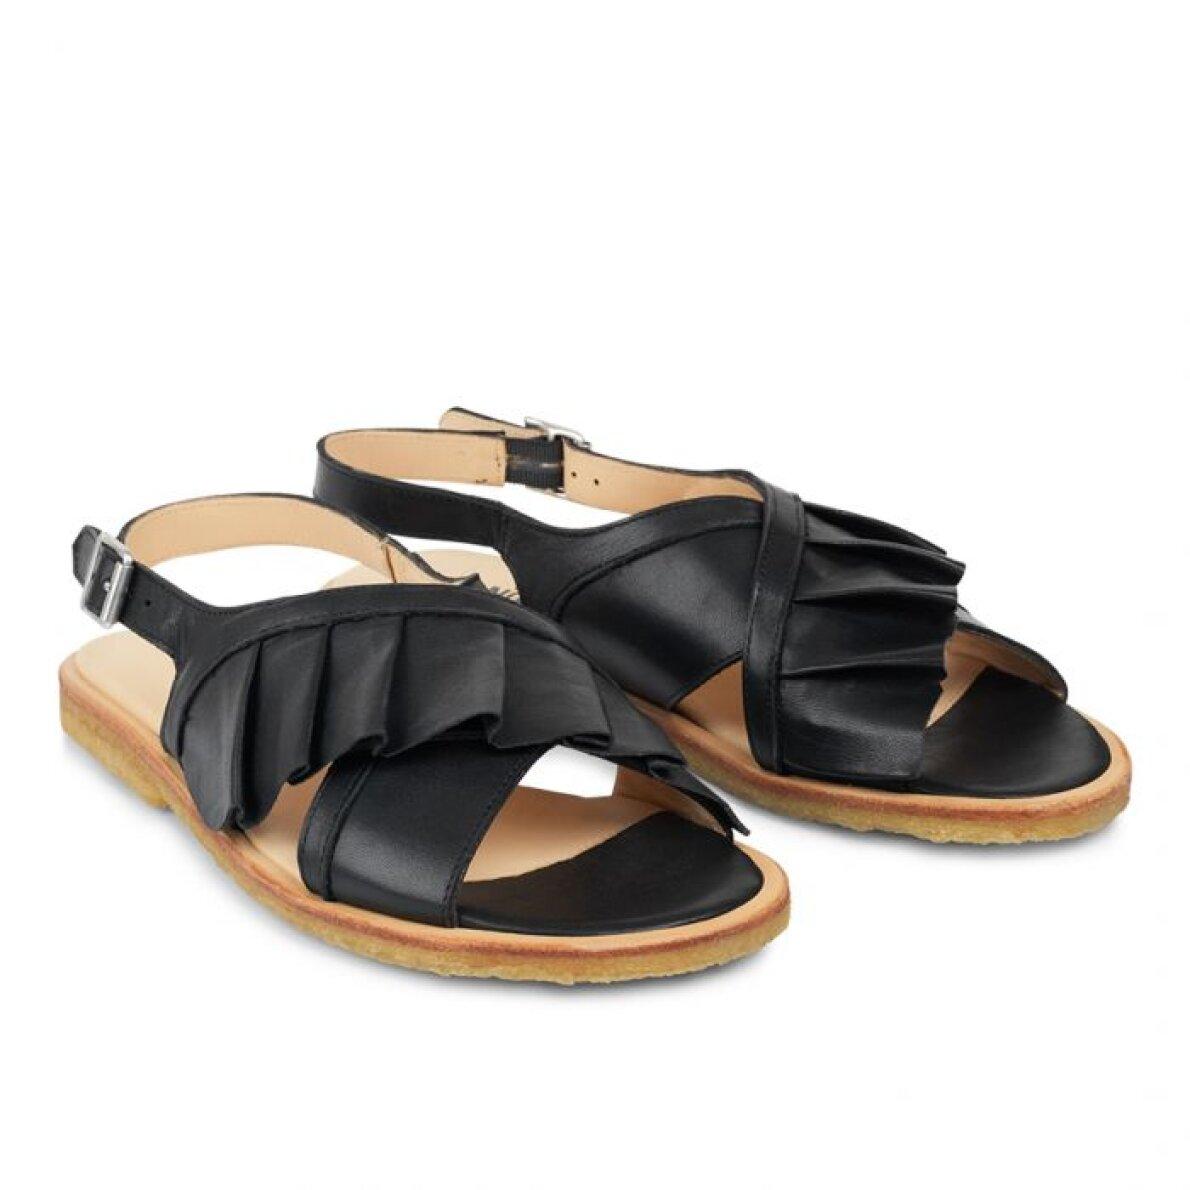 3ba647e17bf5 ... Angulus - Angulus 5538-101 sort dame sandal med flæse ...